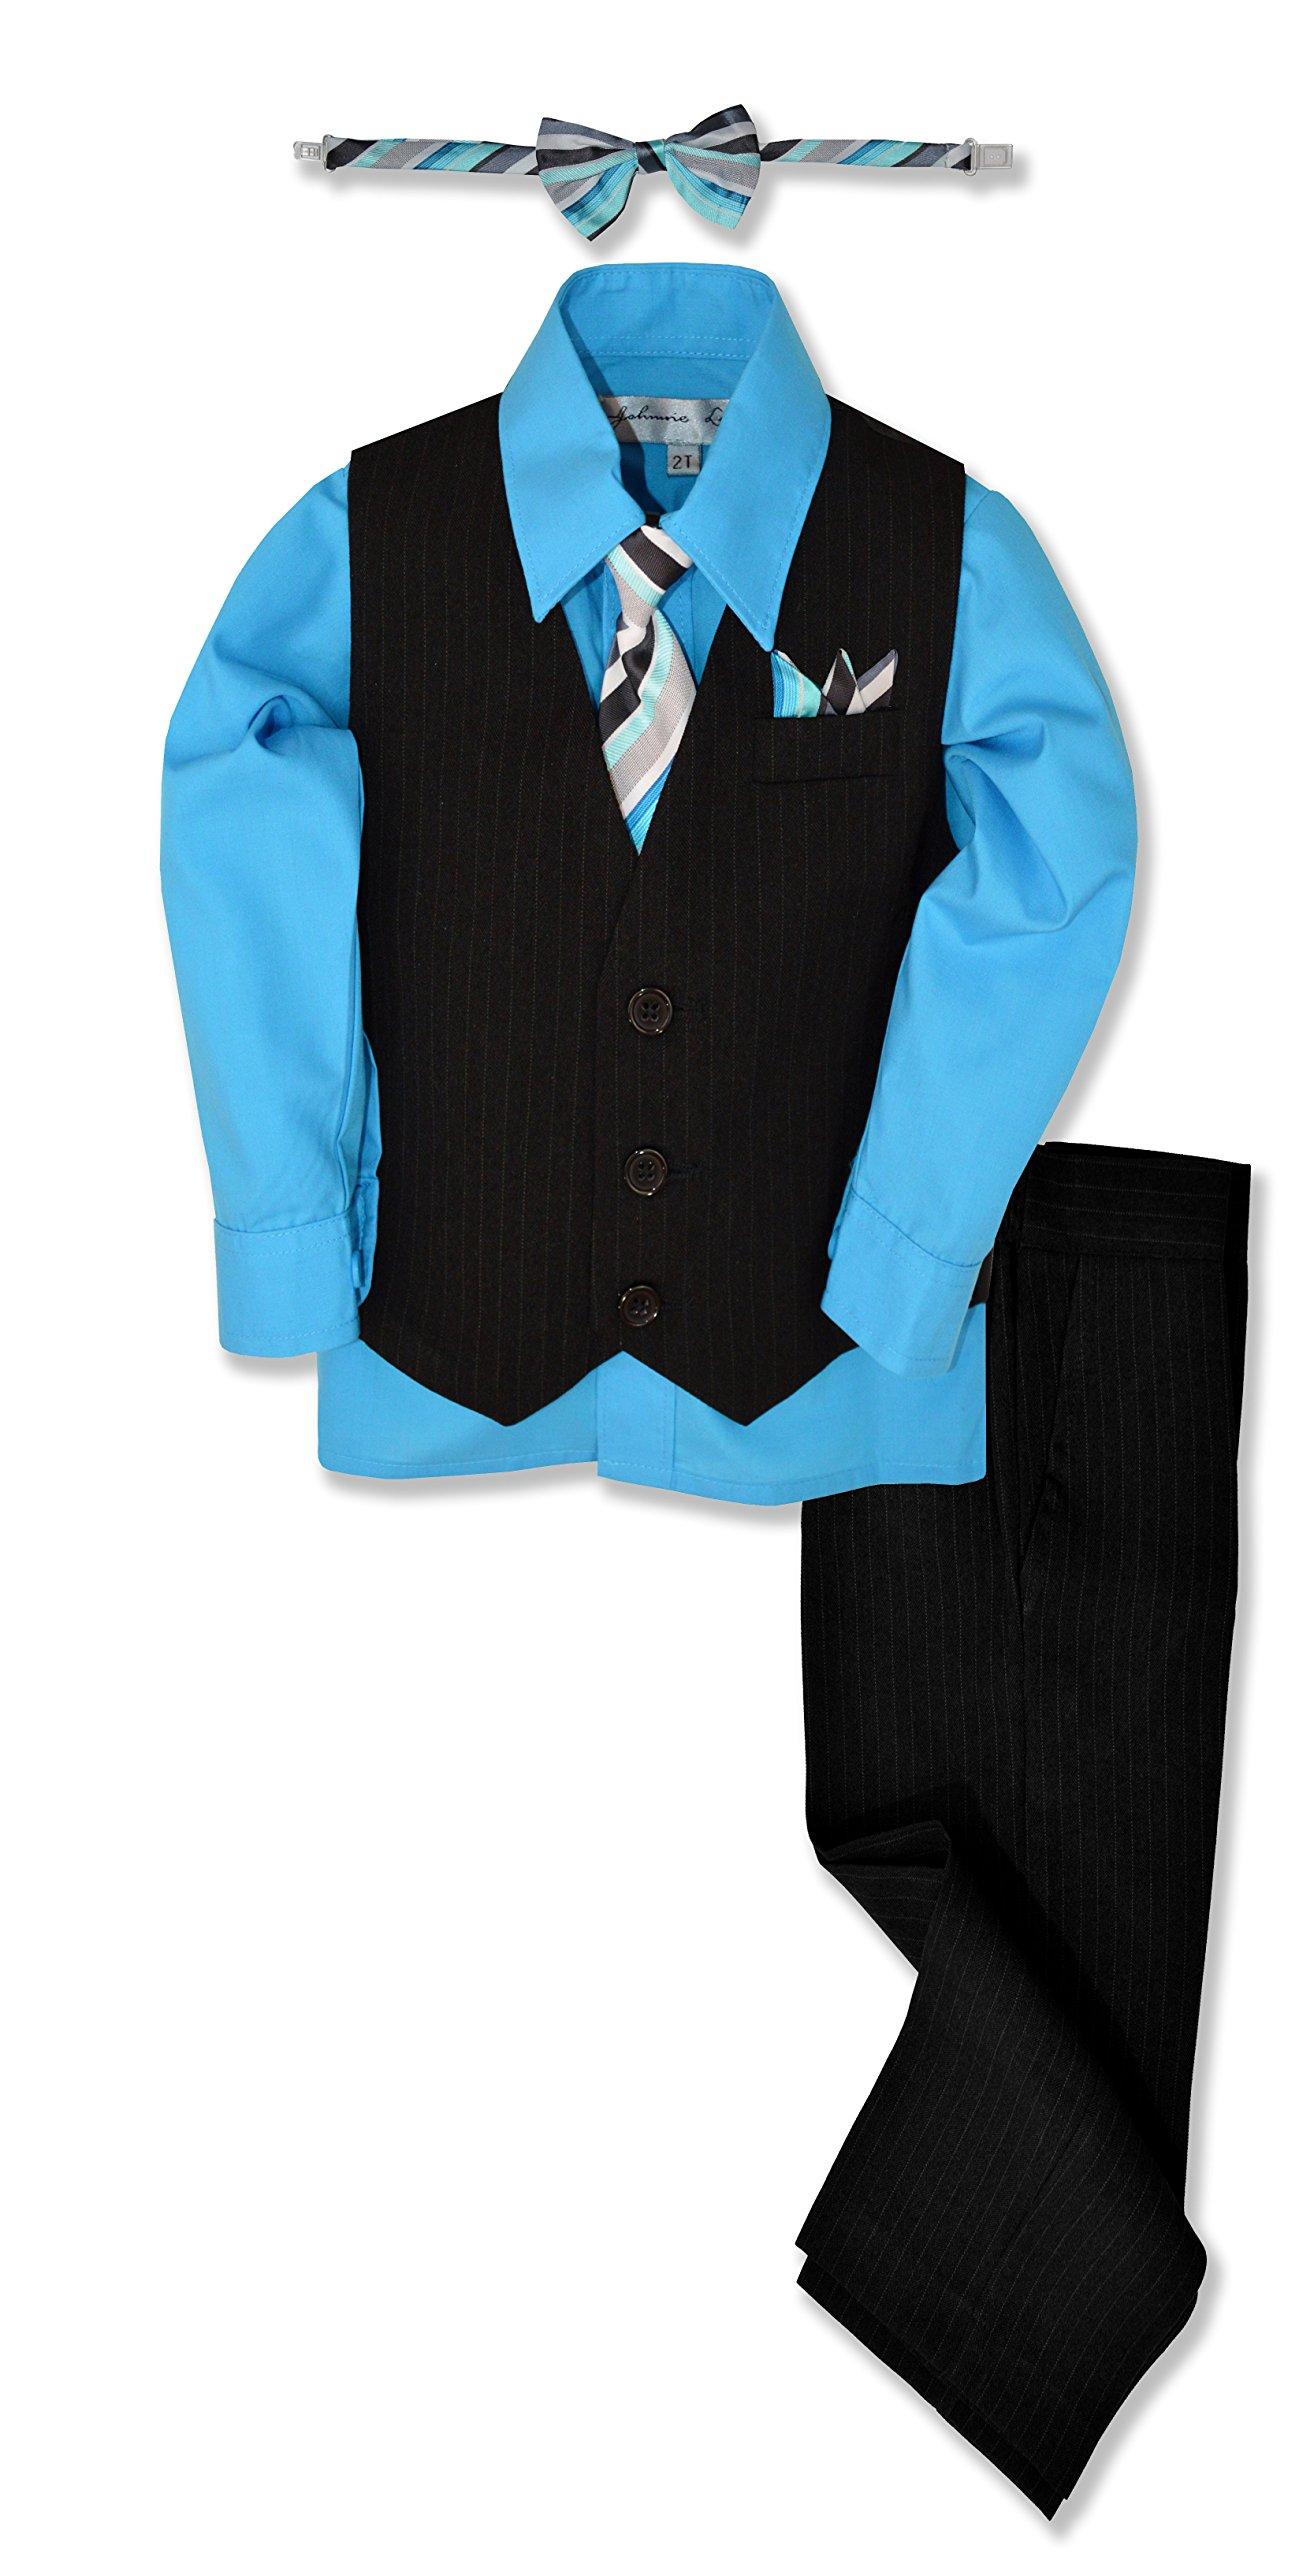 Johnnie Lene JL40 Pinstripe Boys Formal Dresswear Vest Set (7, Black/Vivid) by Johnnie Lene (Image #1)